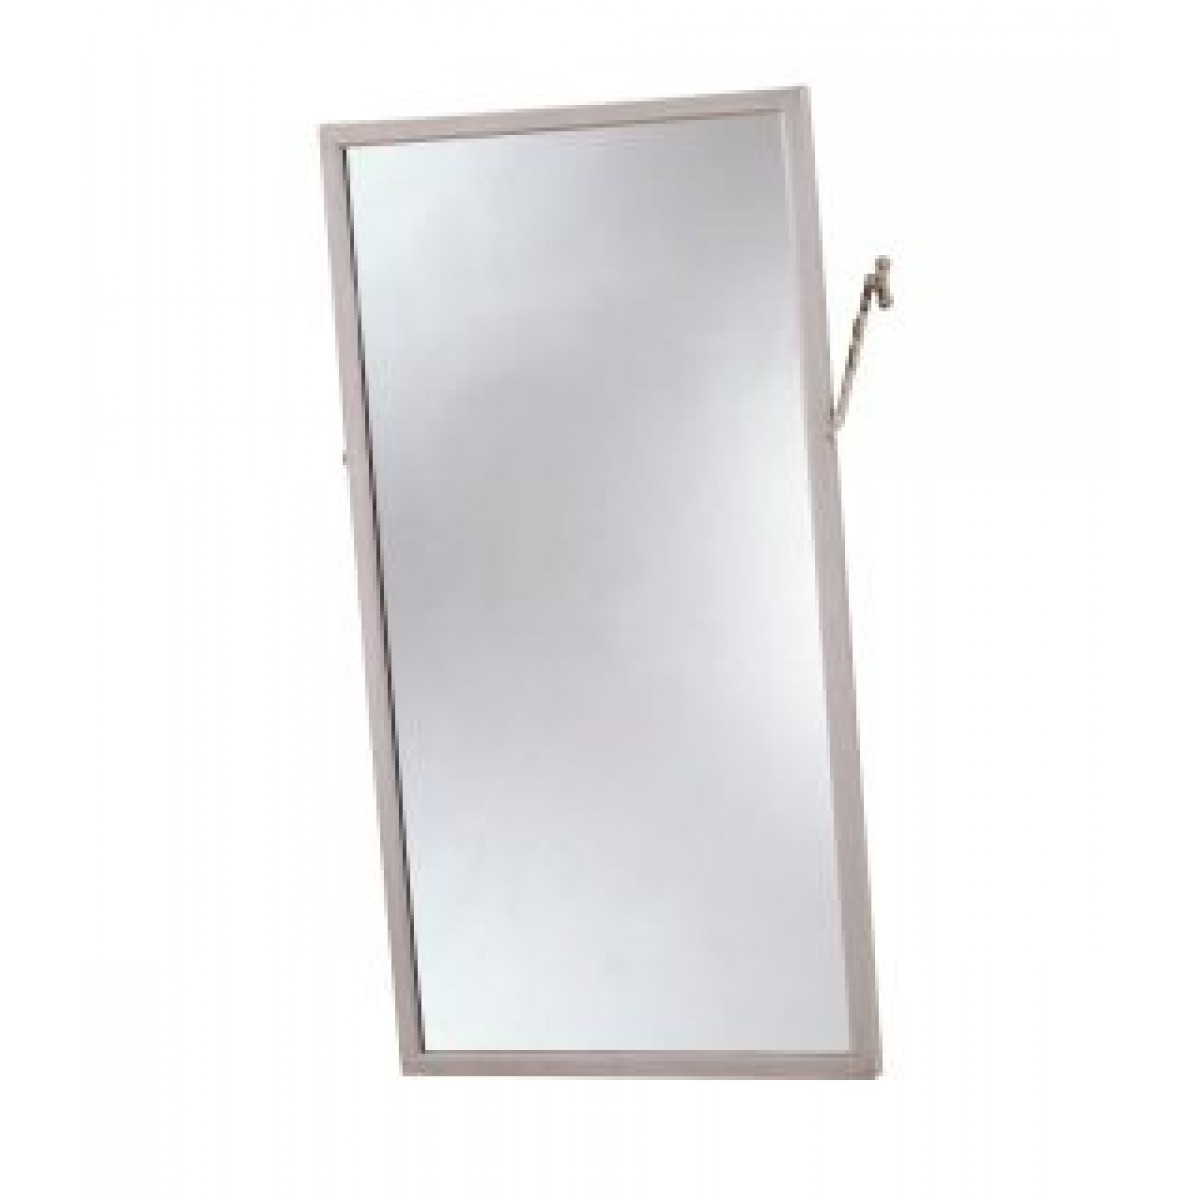 Tilting Wall Mirrors Regarding Fashionable Bobrick B 294 Angle Frame Tilting Mirrors (View 14 of 20)